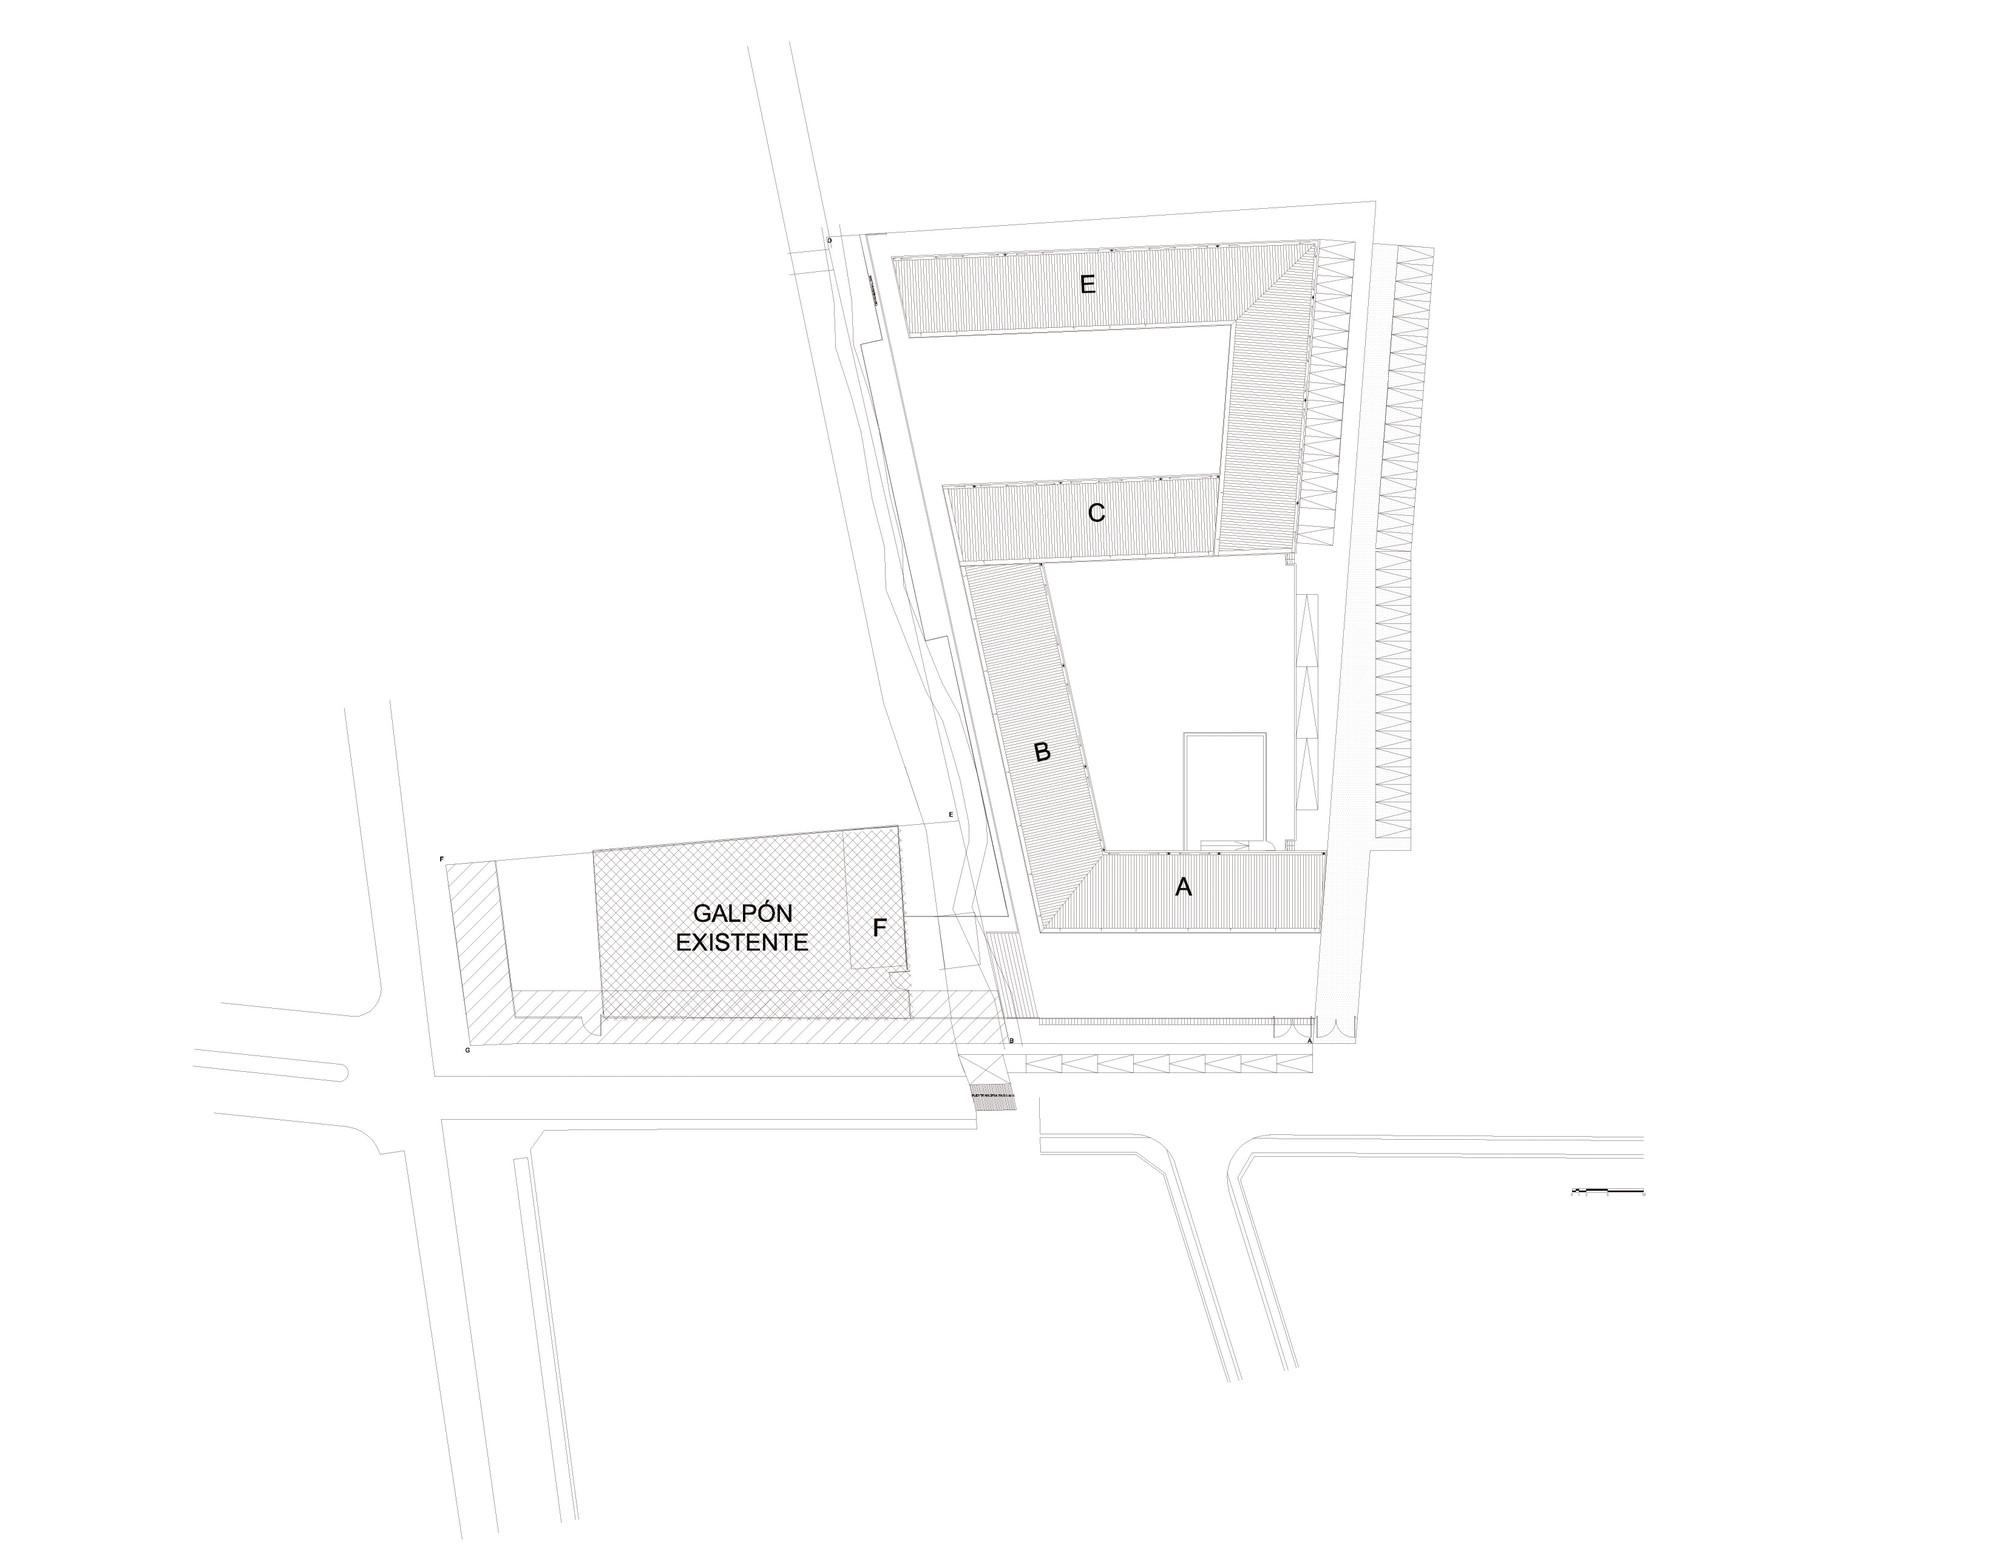 Galeria de escola san sebasti n tidy arquitectos 20 - Arquitectos san sebastian ...